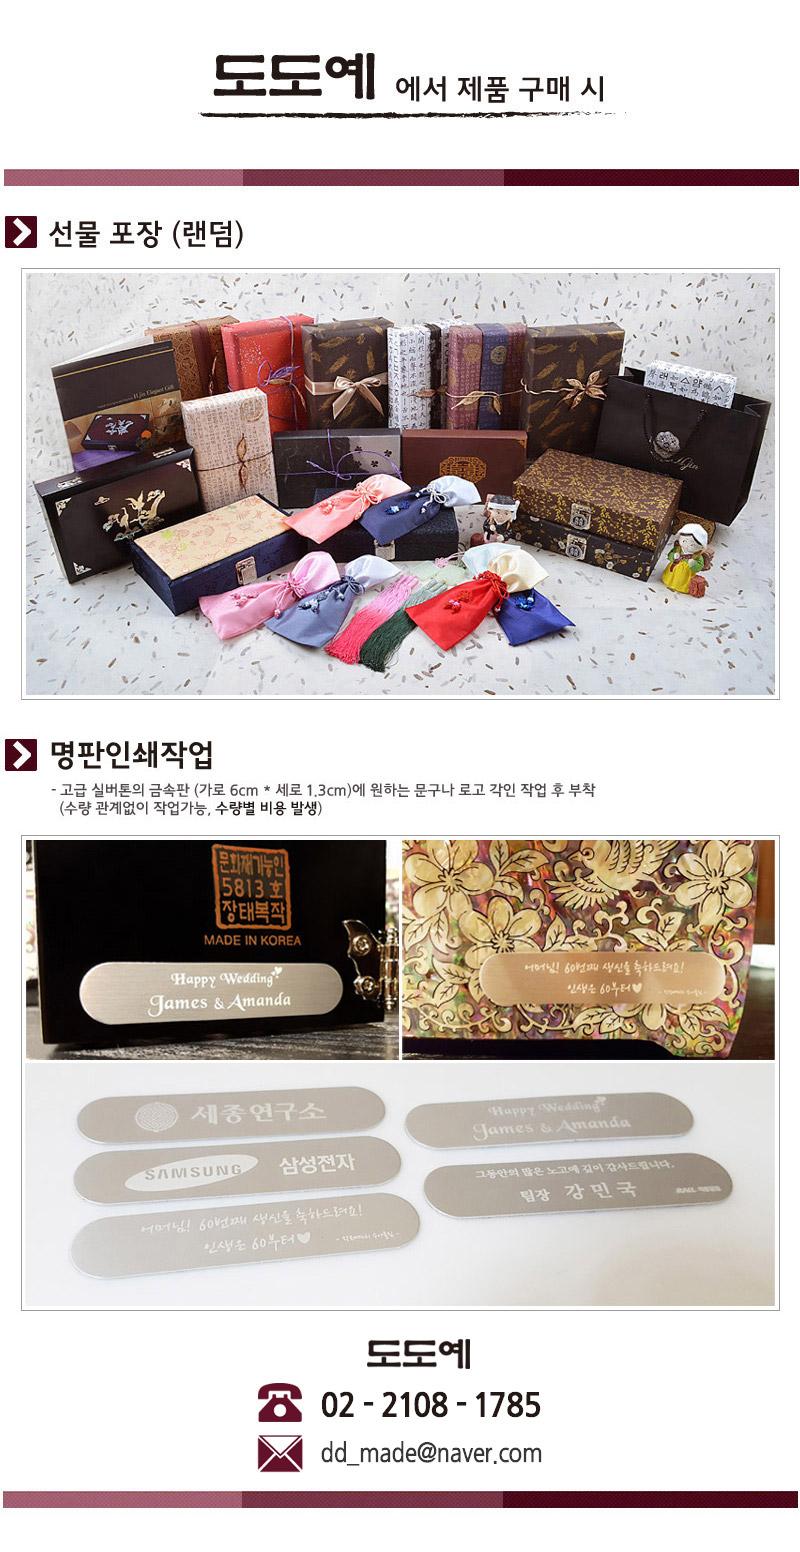 H.jin 나전칠기 자개 서류함 (십장생) - 에이치진, 936,000원, 데스크정리, 서류/파일홀더